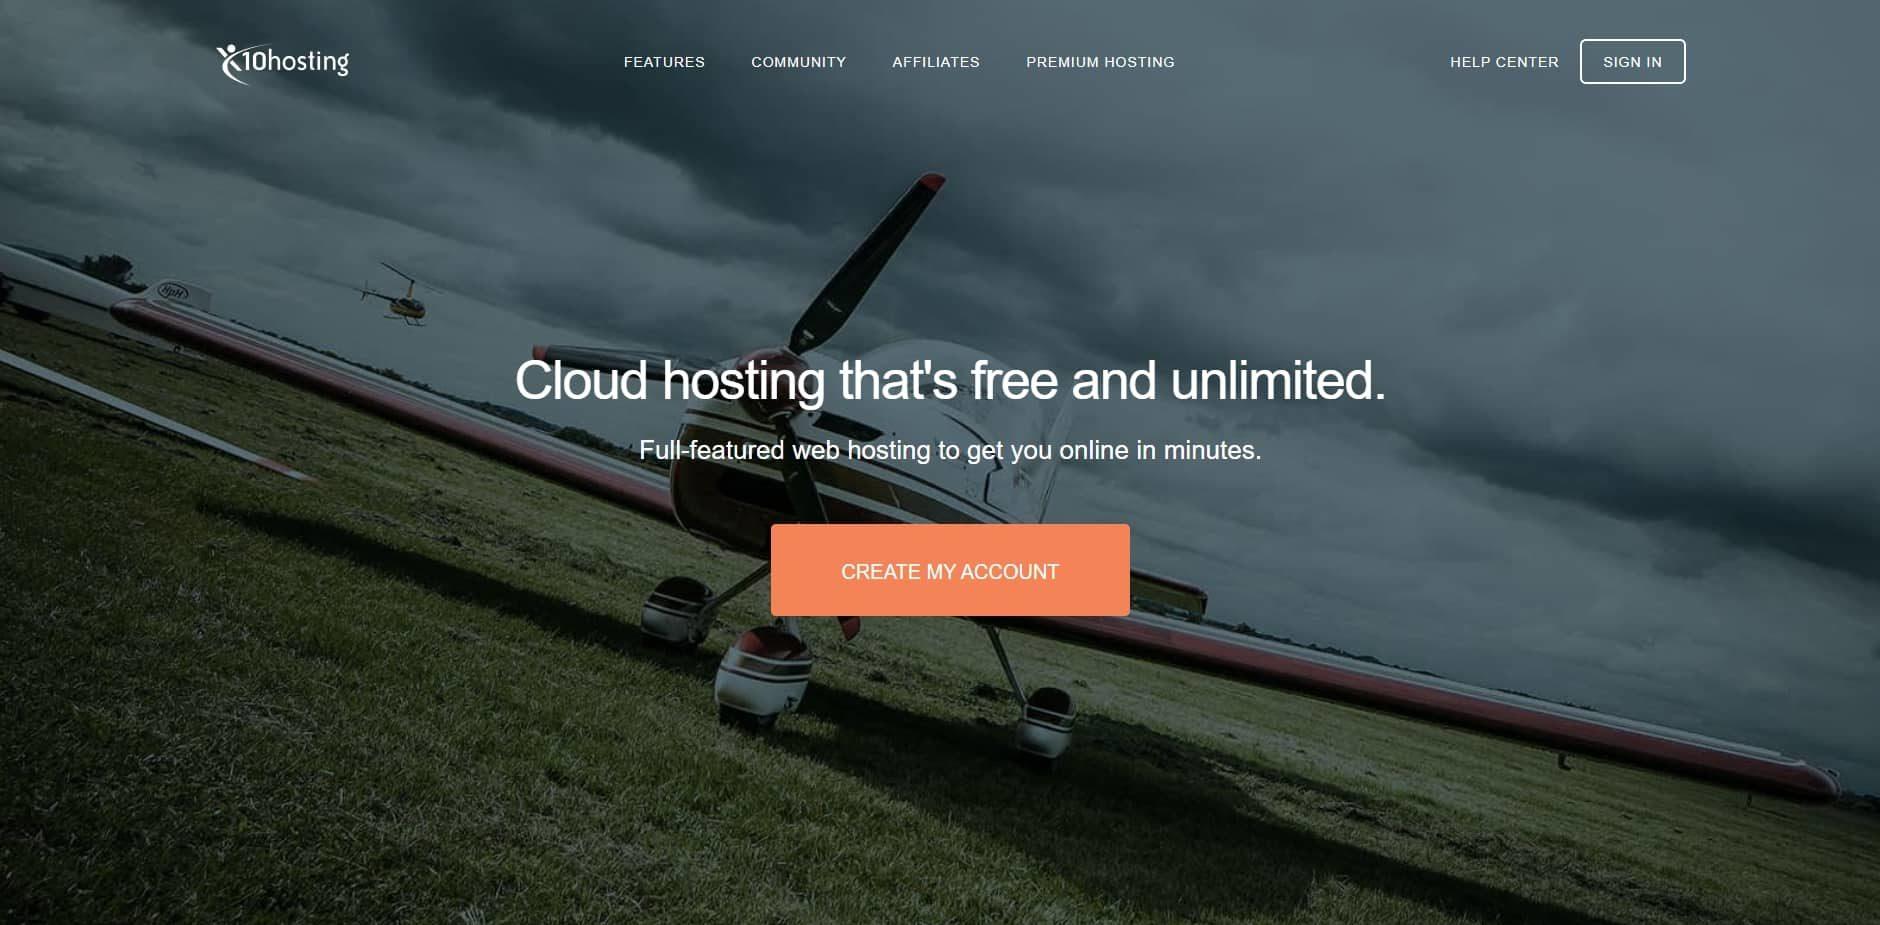 X10hosting web